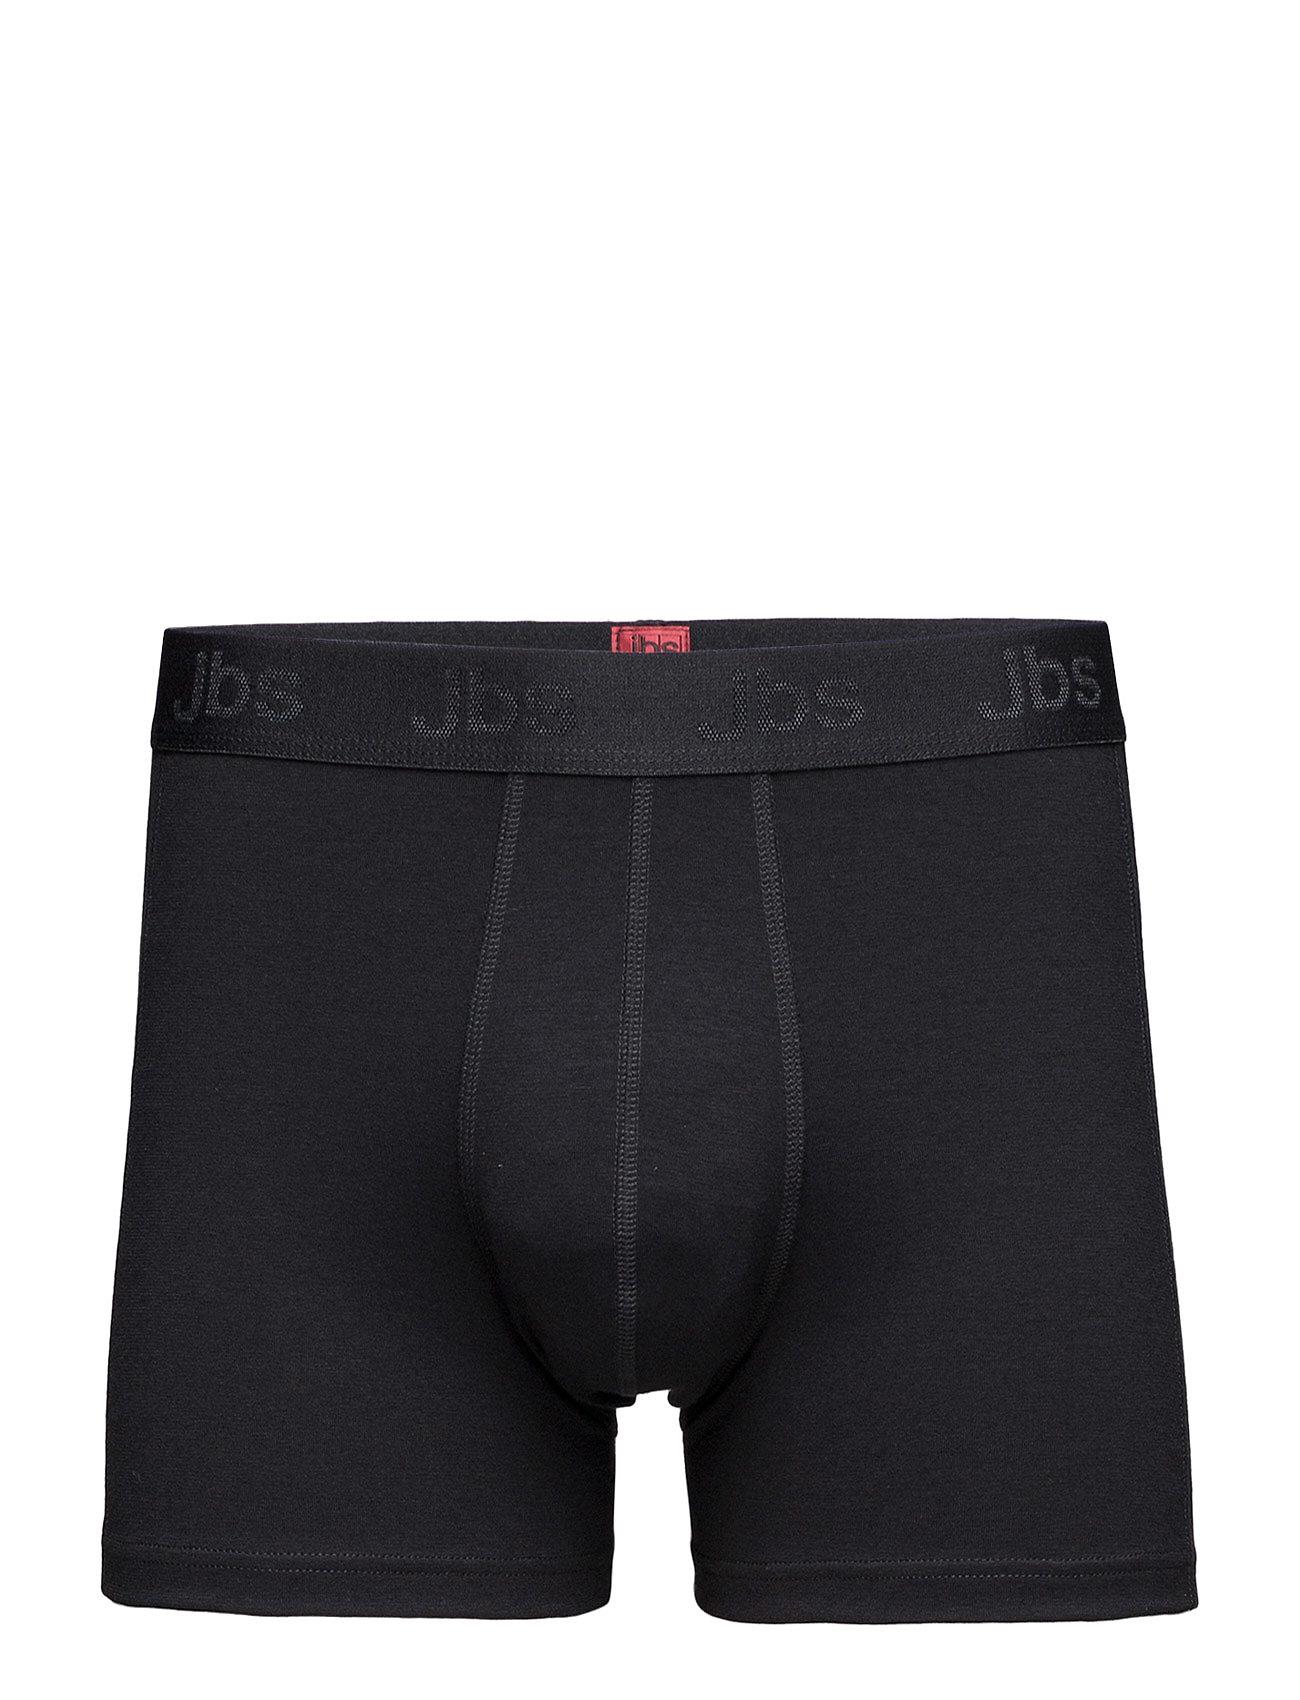 JBS Basic tights - BLACK